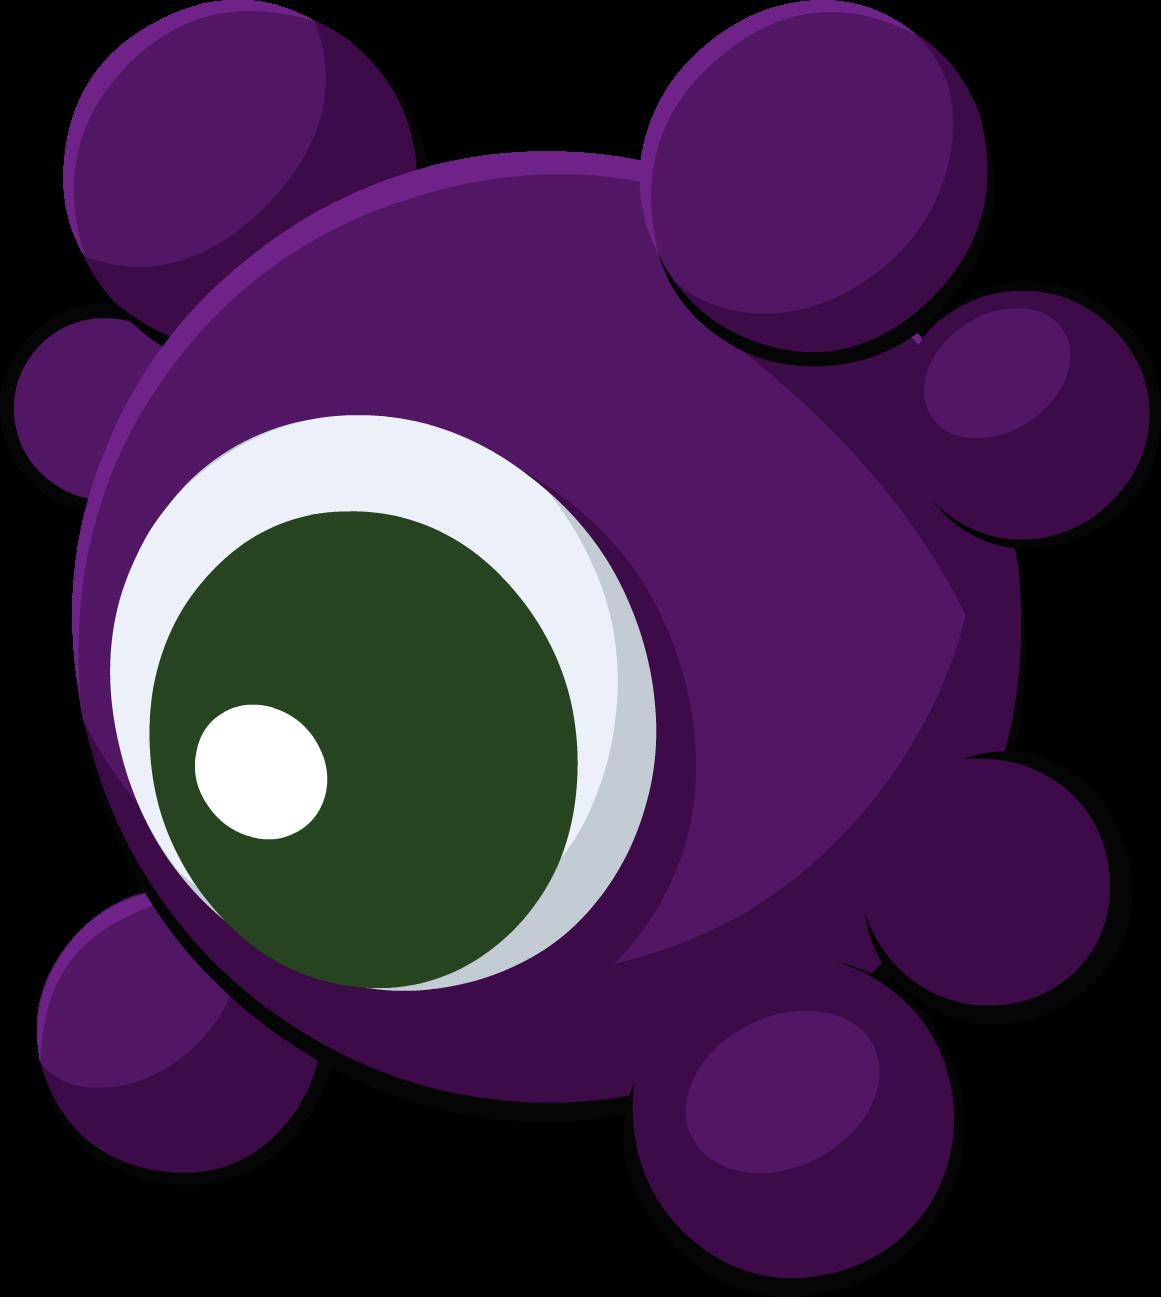 spooky clipart purple #143952492